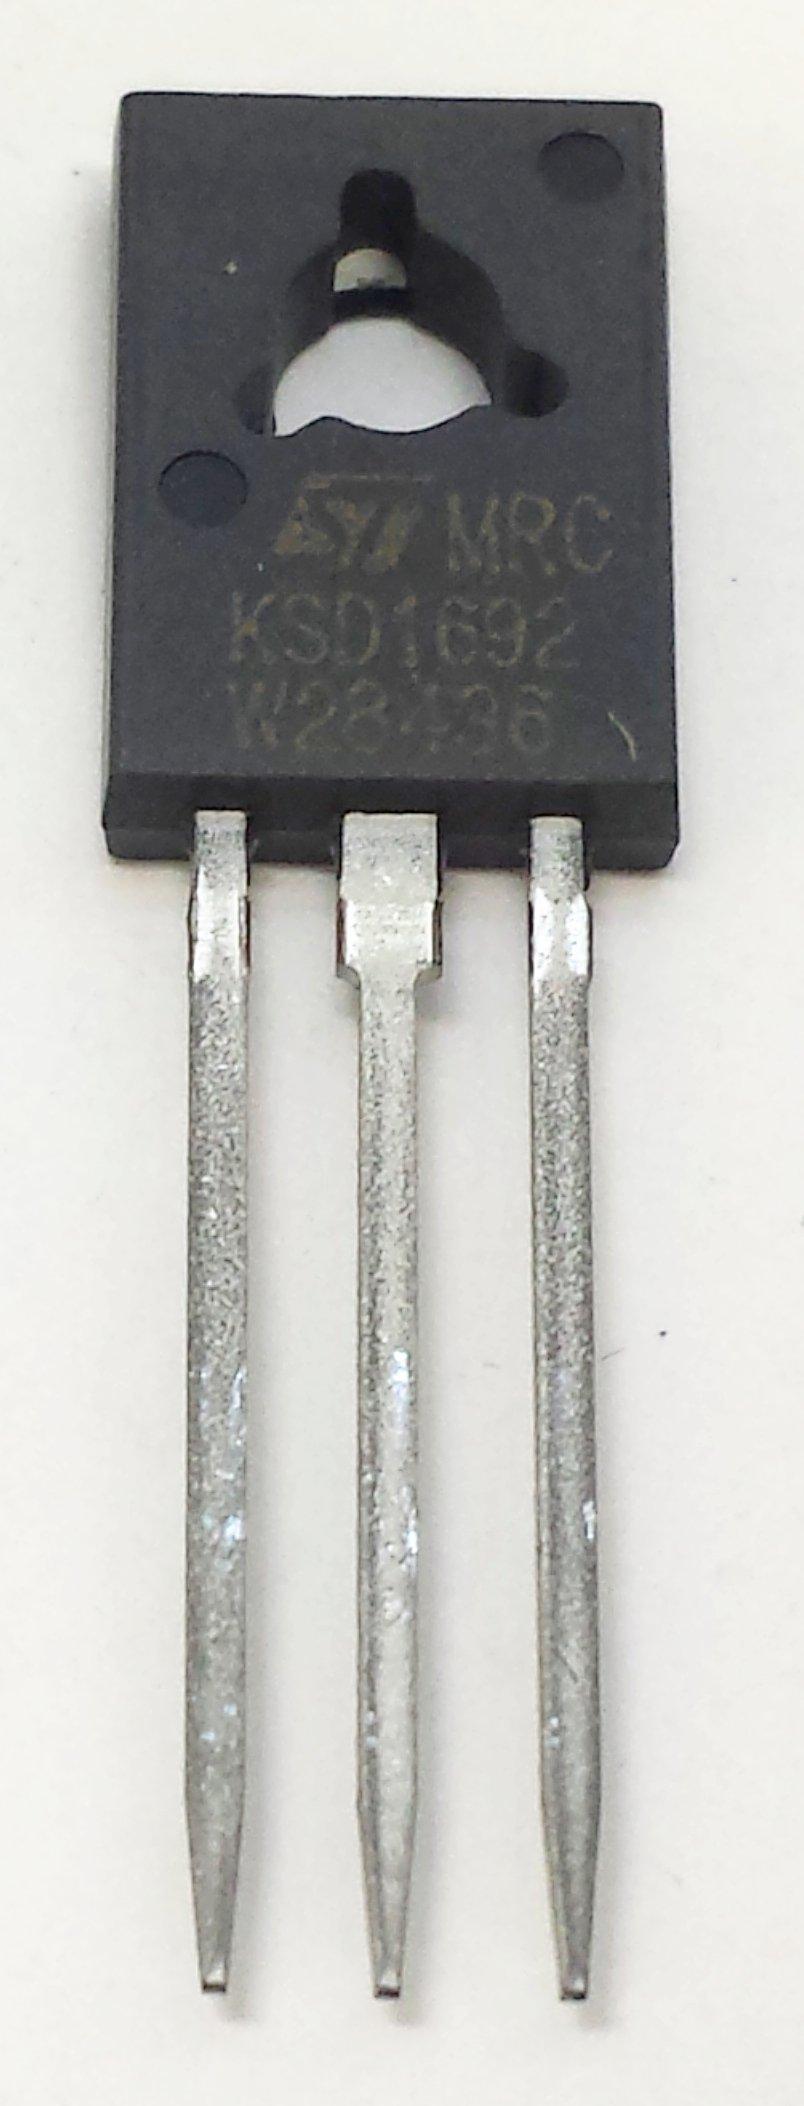 20 pieces KSD1692 NPN POWER DARLINGTON TRANSISTOR | 4A | Vceo 100V | Vcbo 100V | Ptot 40W | SOT32 Gehäuse